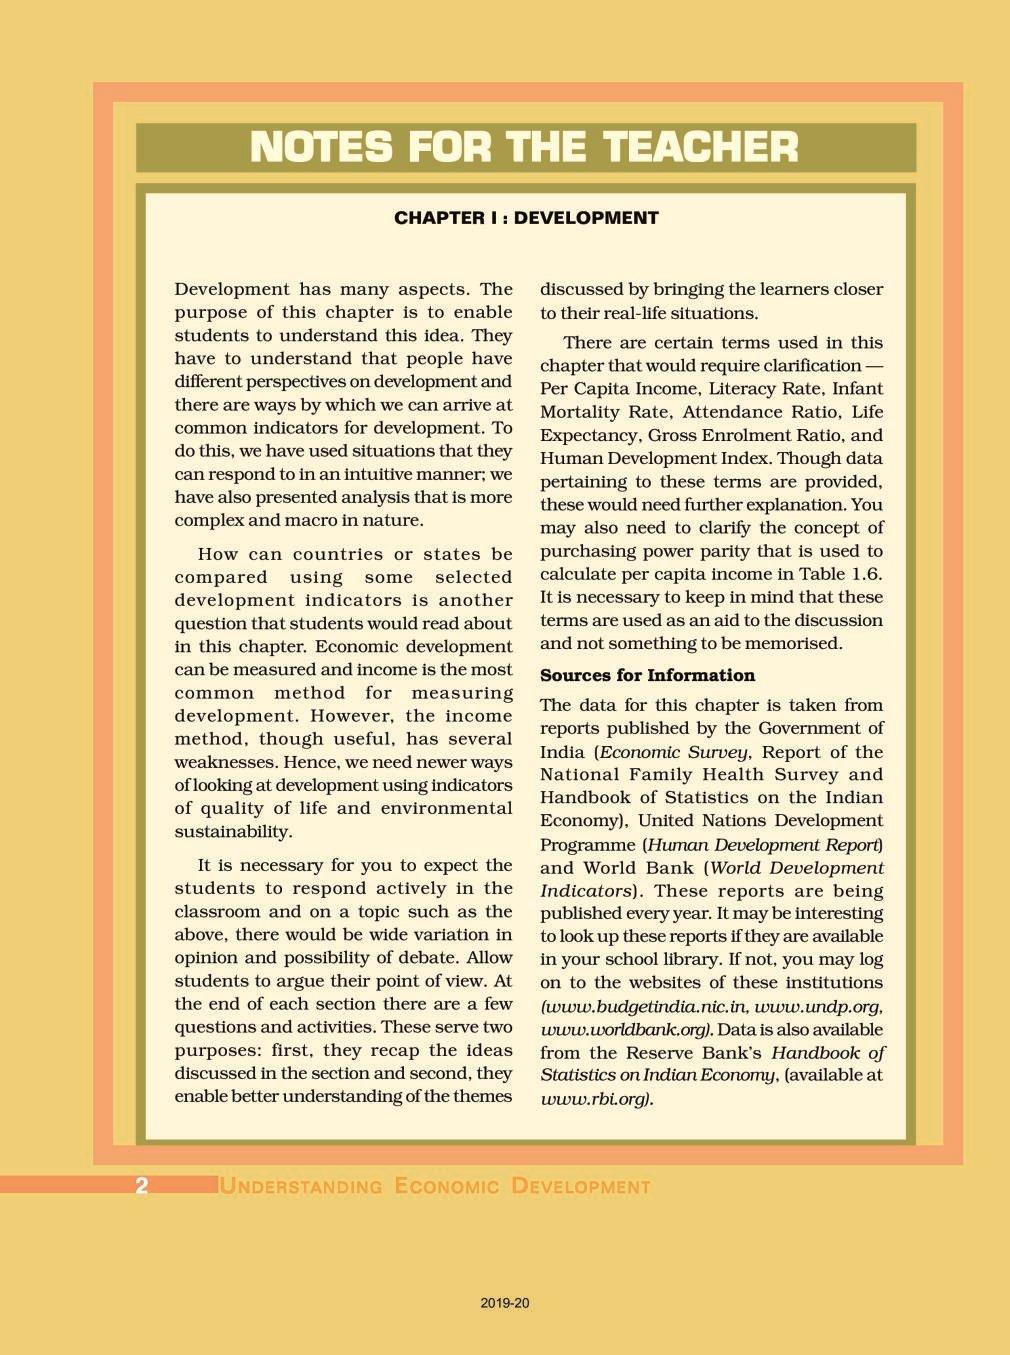 NCERT Book Class 10 Social Science (Economics) Chapter 1 Development - Page 1